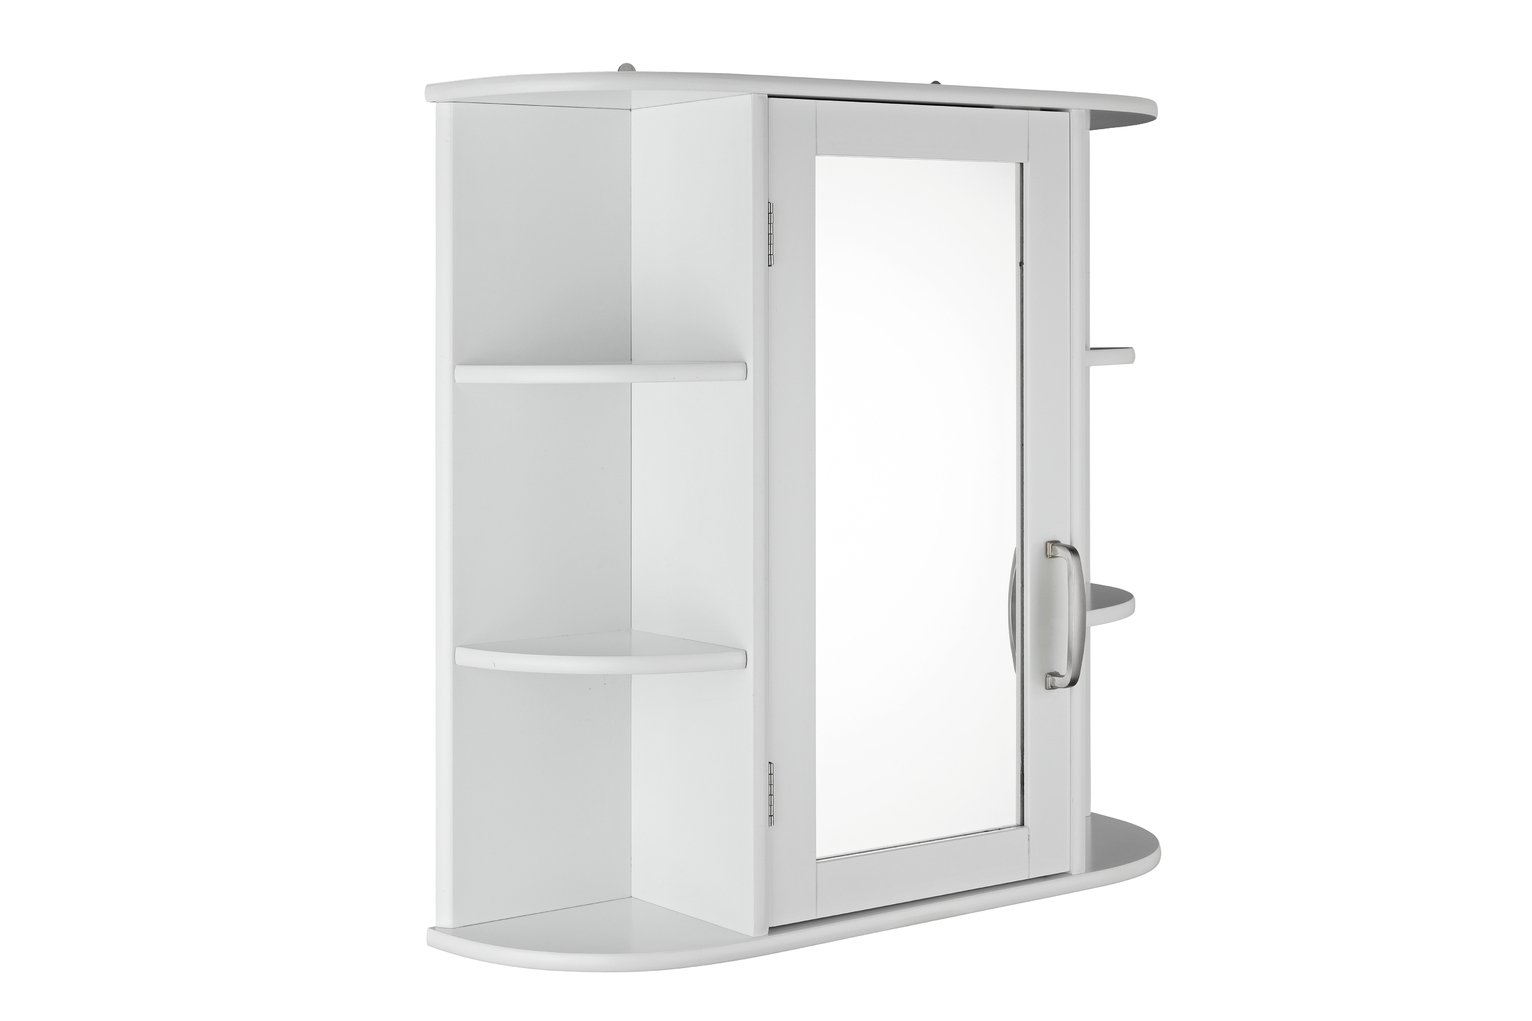 Argos Home Single Mirrored Wall Cabinet - White